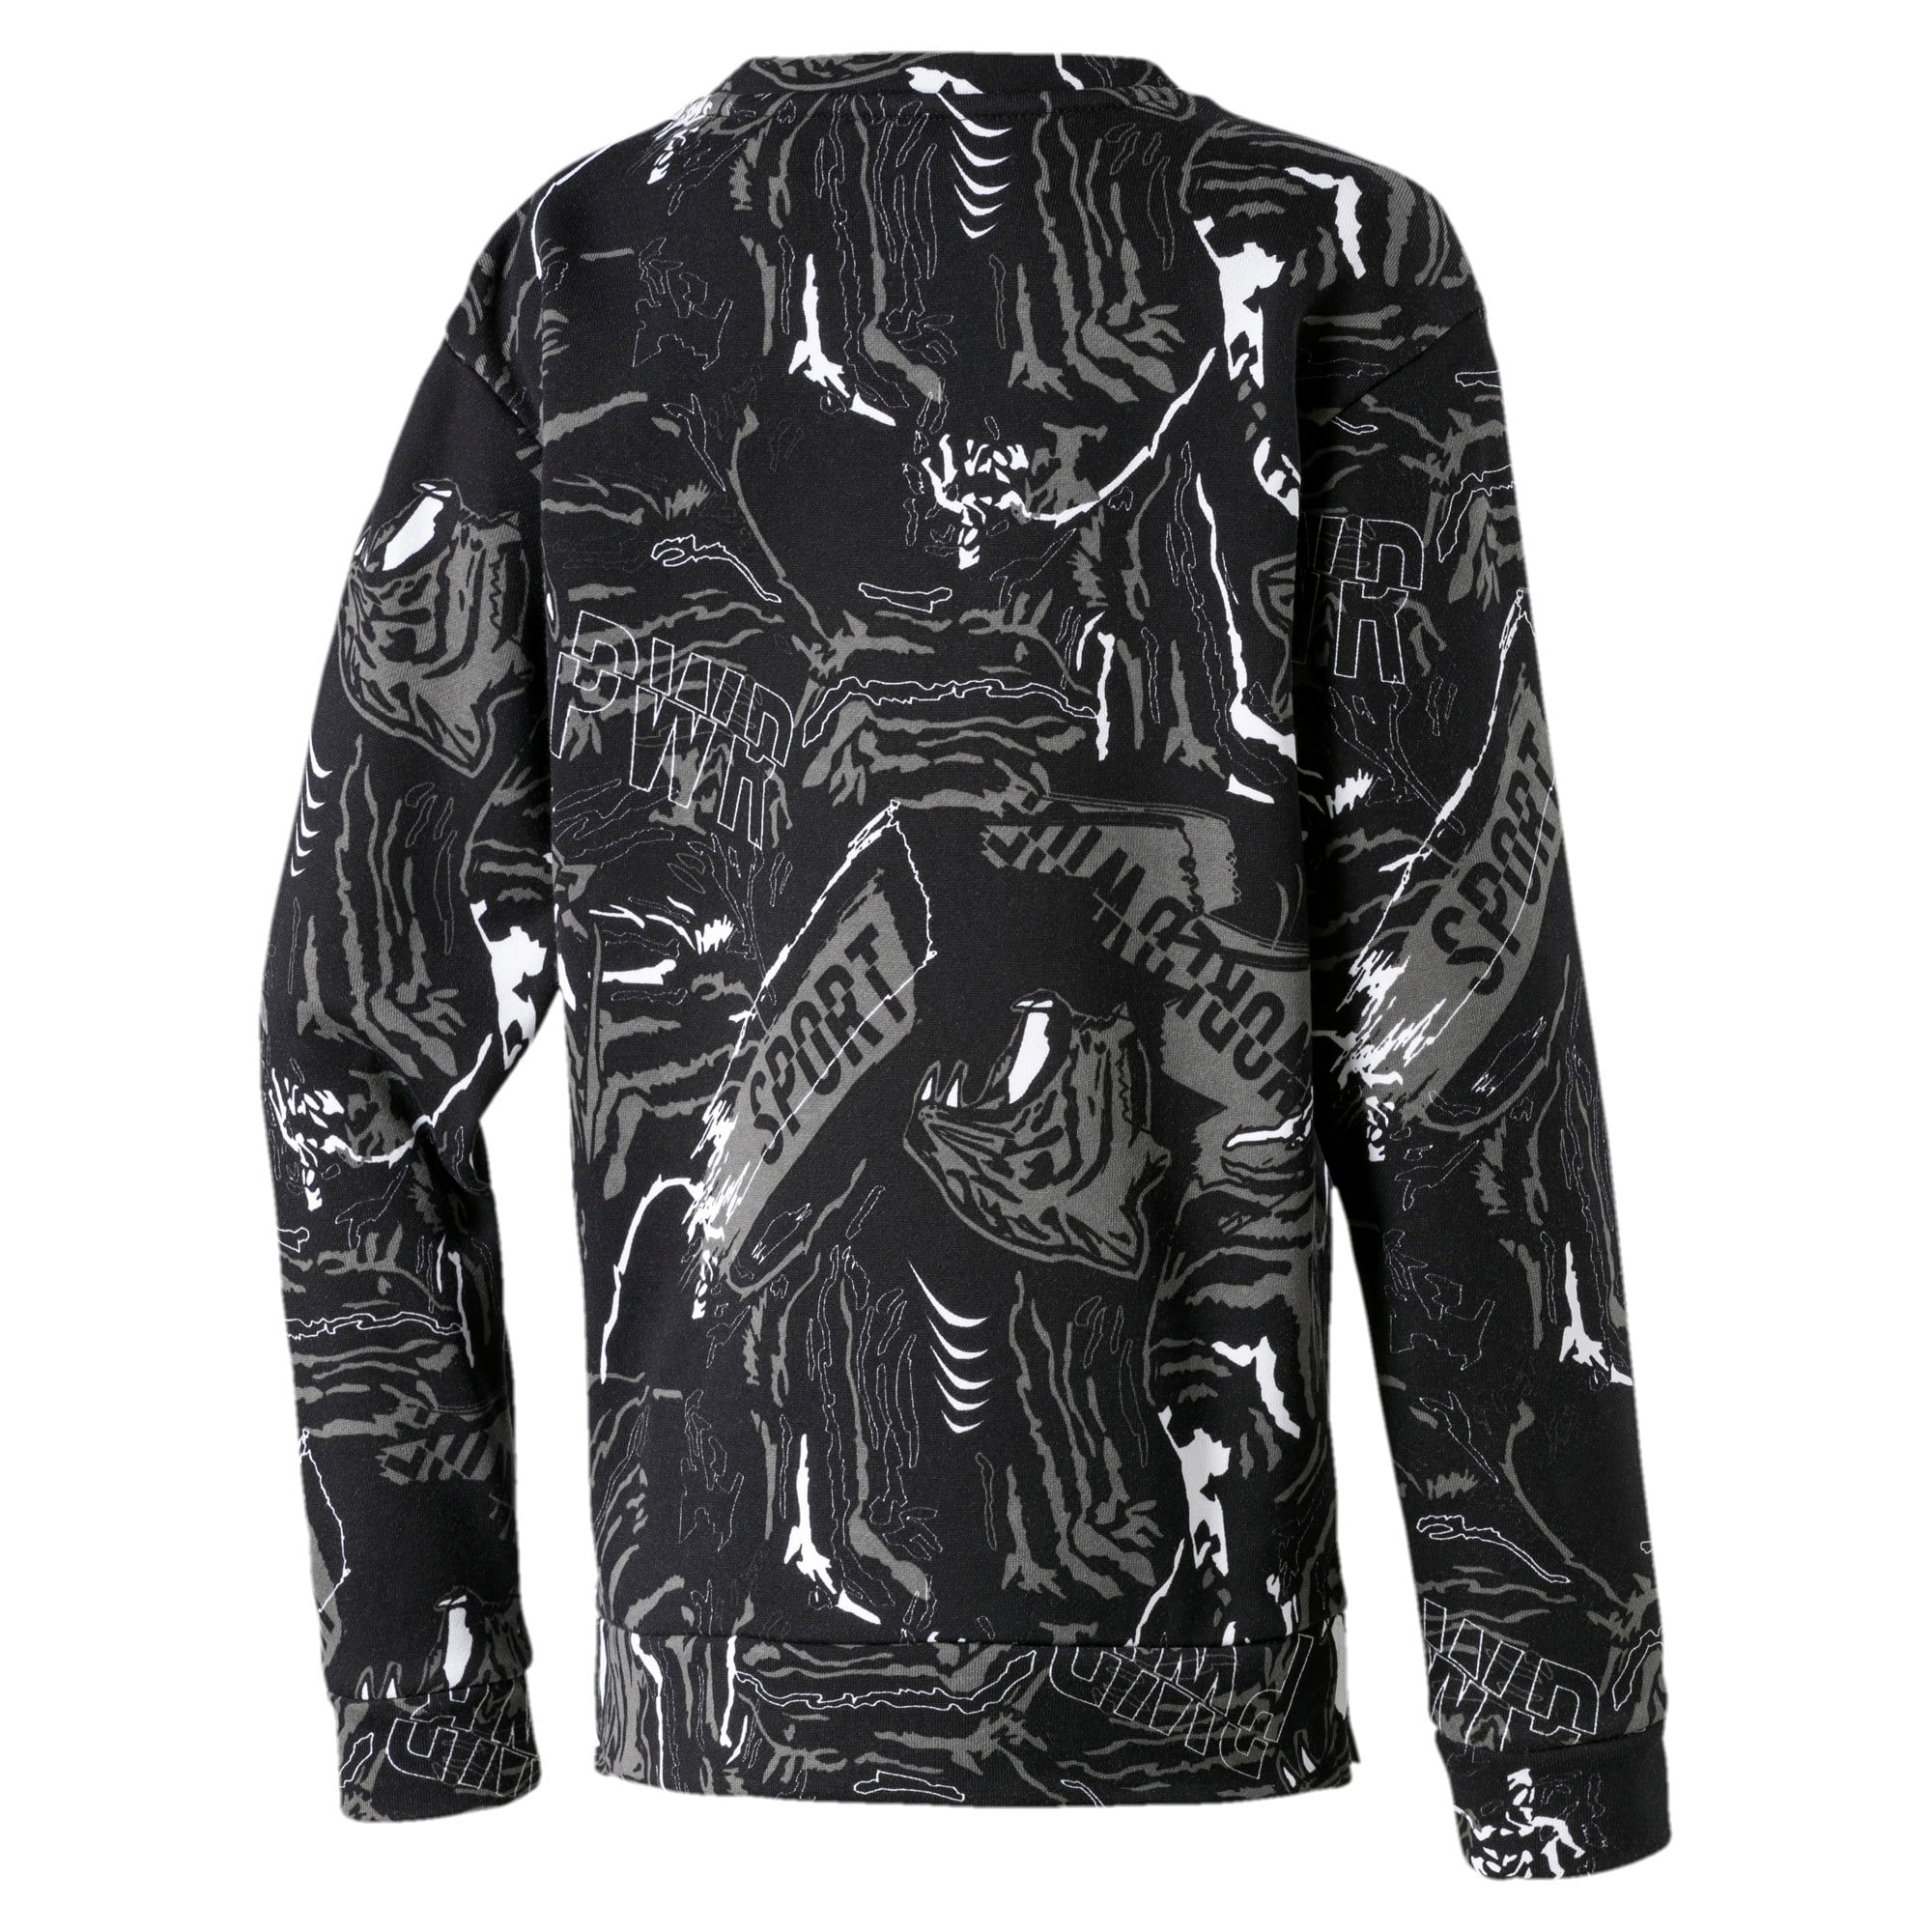 Thumbnail 2 of Alpha Graphic Long Sleeve Boys' Shirt, Puma Black, medium-IND